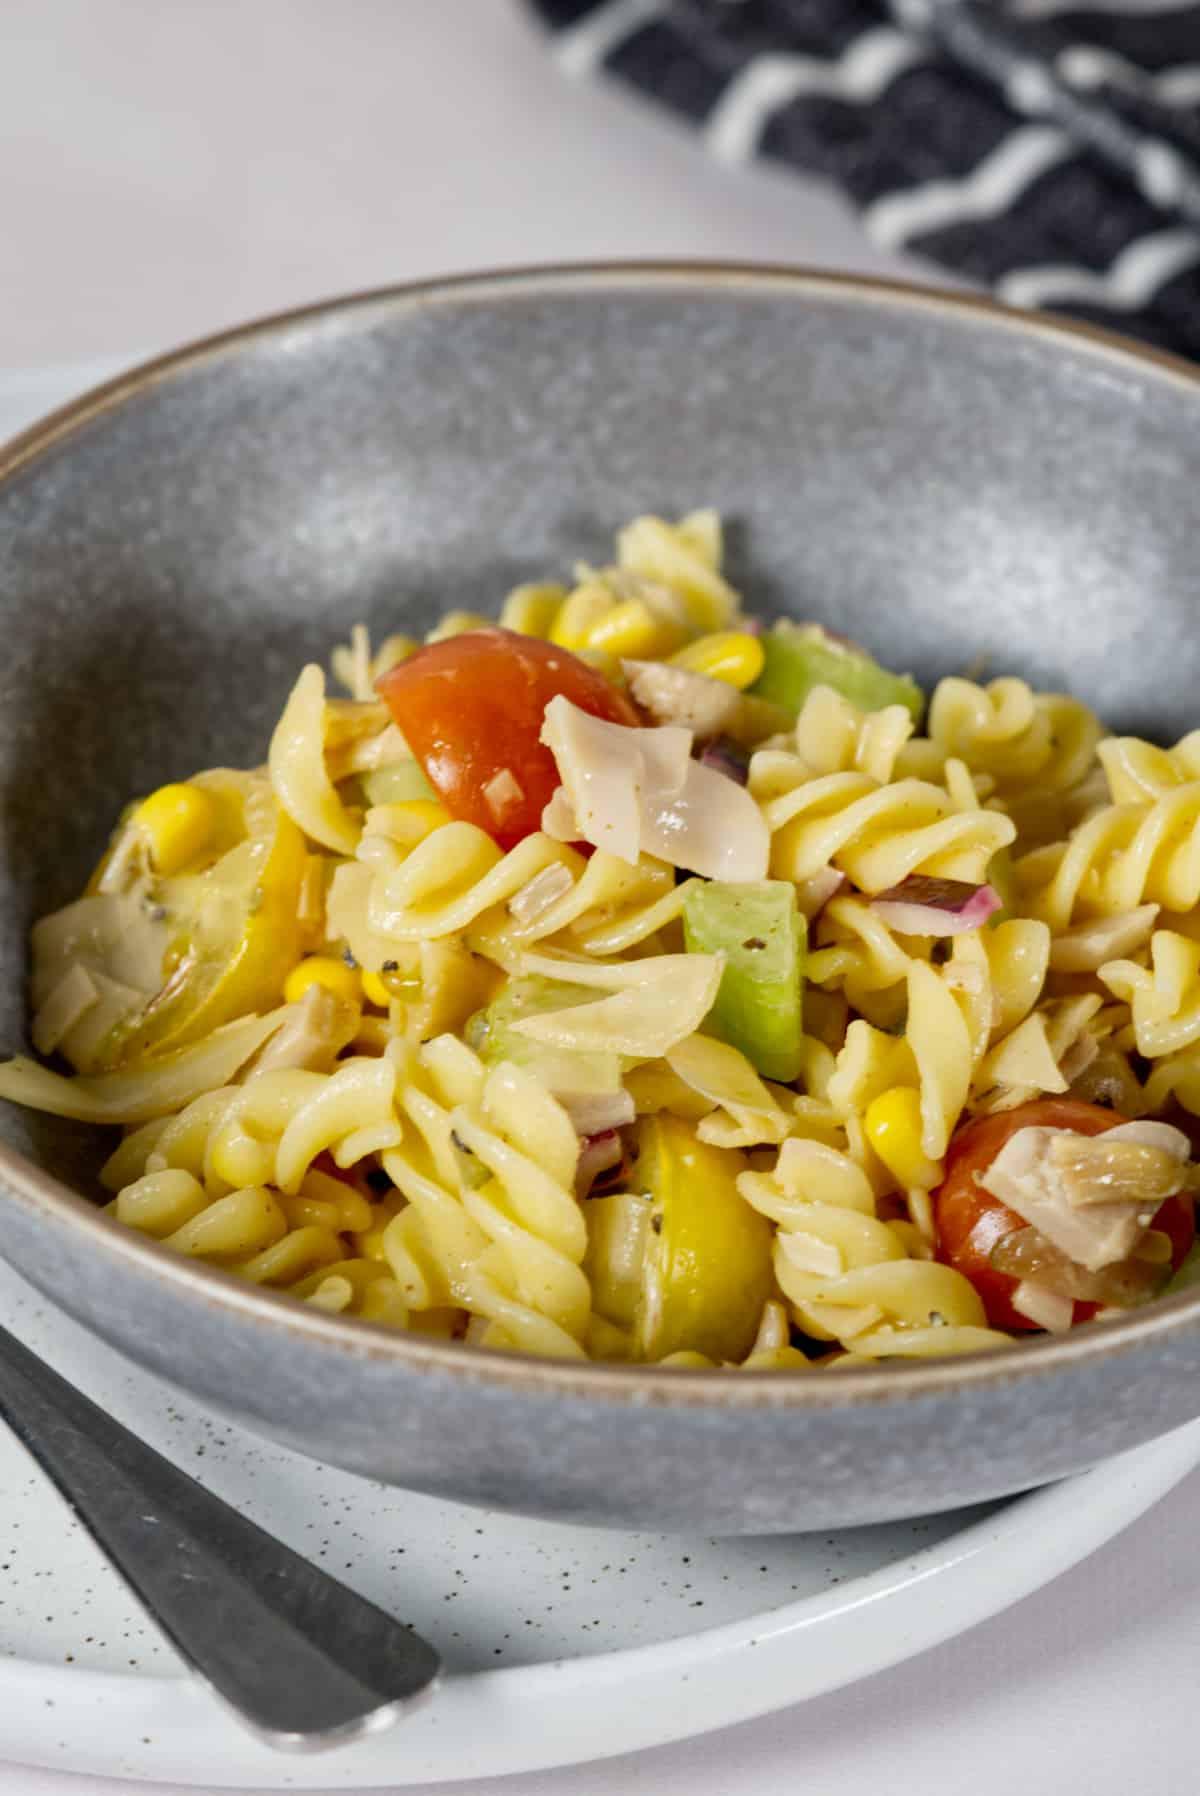 vegan pasta salad in a grey bowl